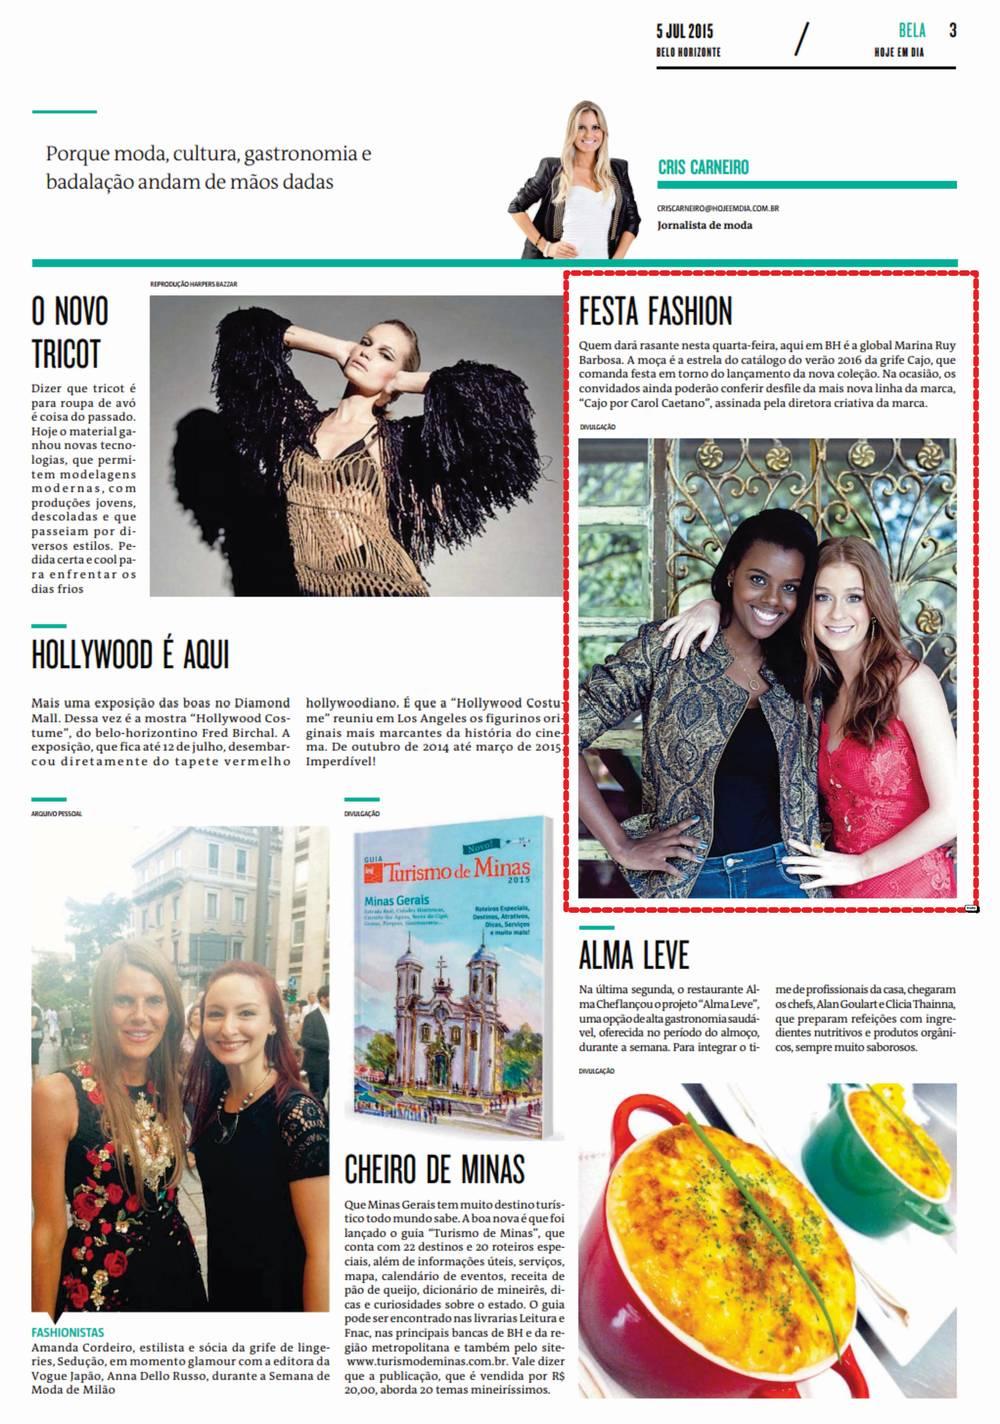 Cajo - Jornal Hoje em Dia - 05-07-2015.jpg